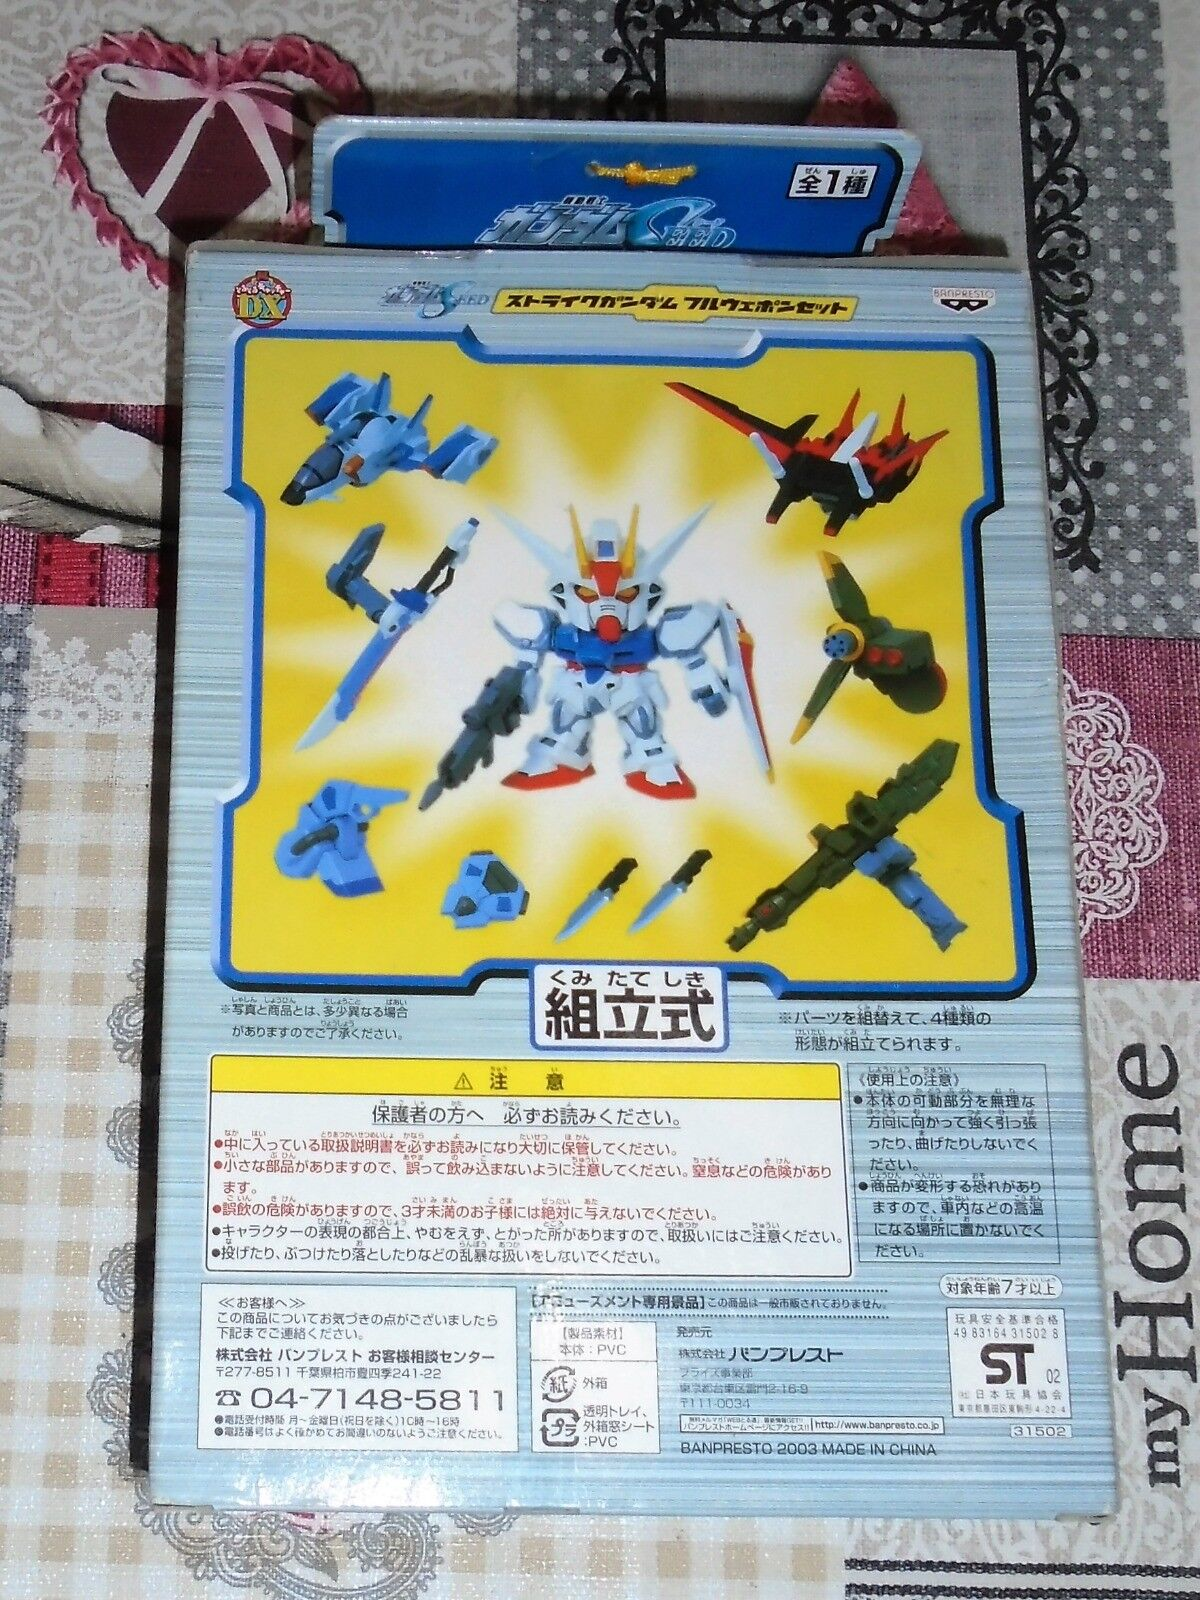 Gundam Seed Gundam Strike Freedom Full Weapon Weapon Weapon Set Super Deformed bff415